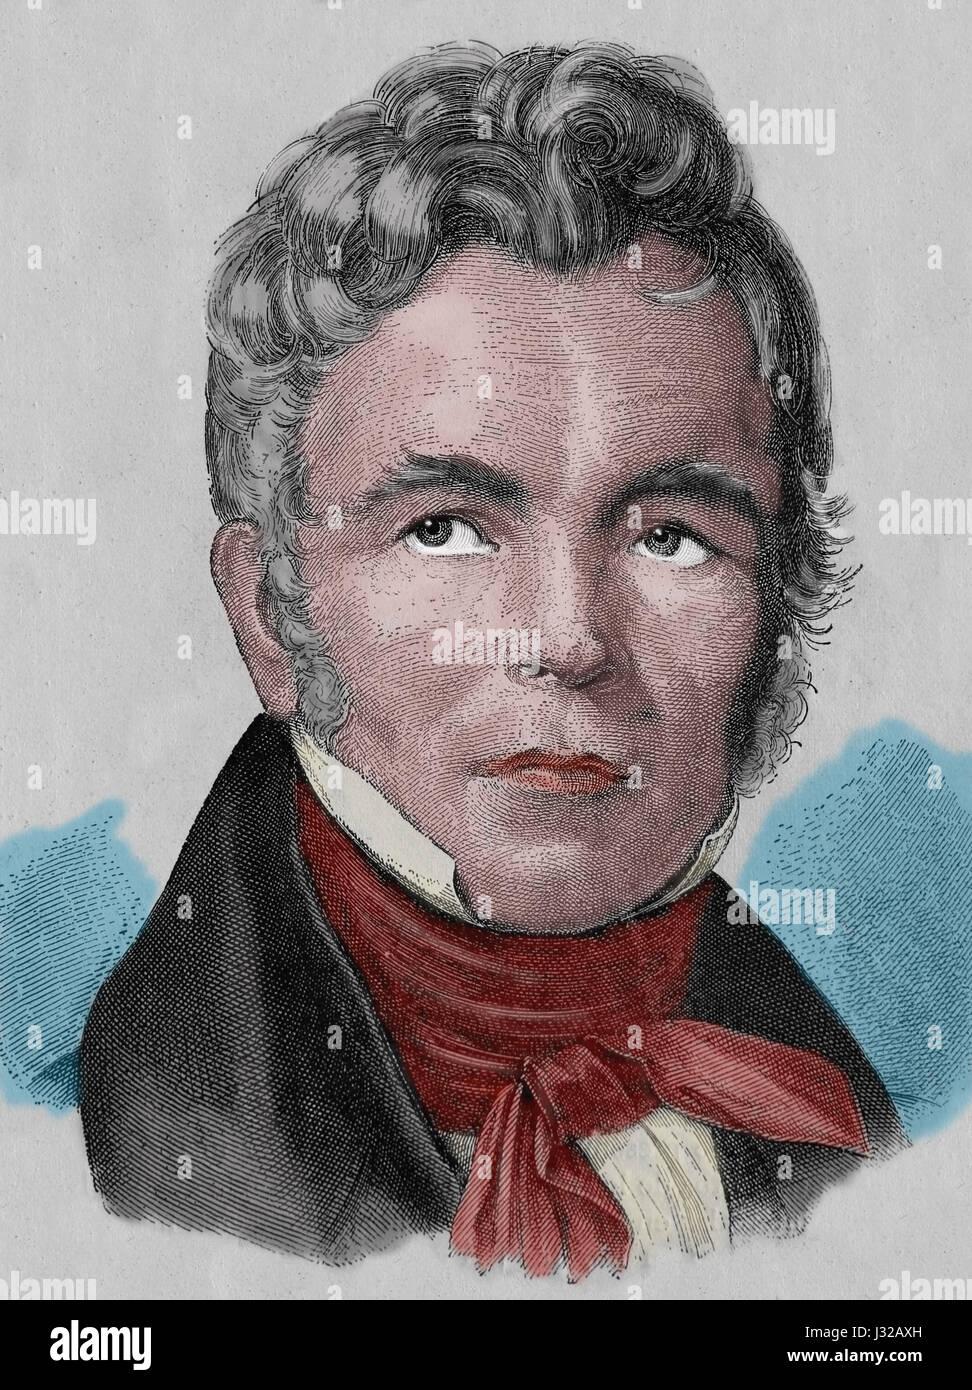 Karl Friedrich Schinkel (1781-1841). Prussian architect, city planner. Engraving. Nuestro Siglo, 1883. Spanish edition. - Stock Image